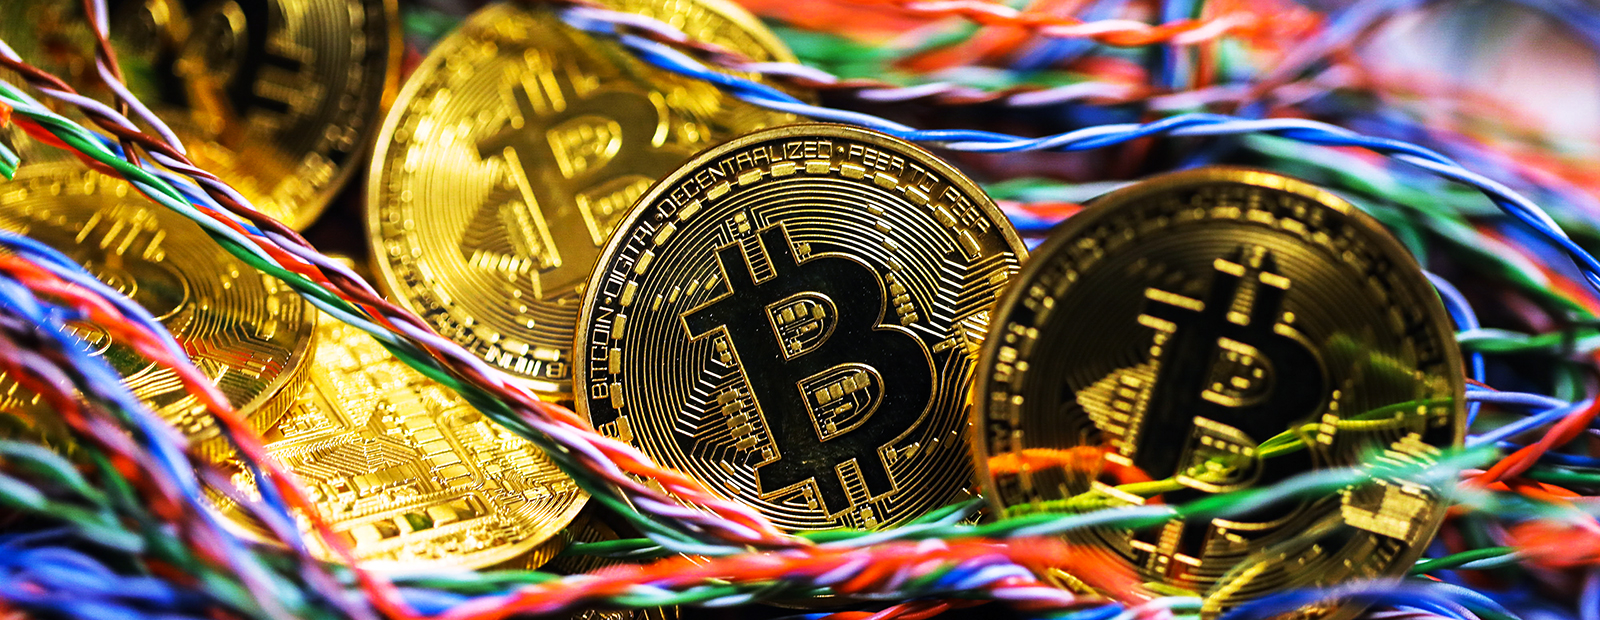 aliexpress priima bitcoin prekyba crypto apie mt4